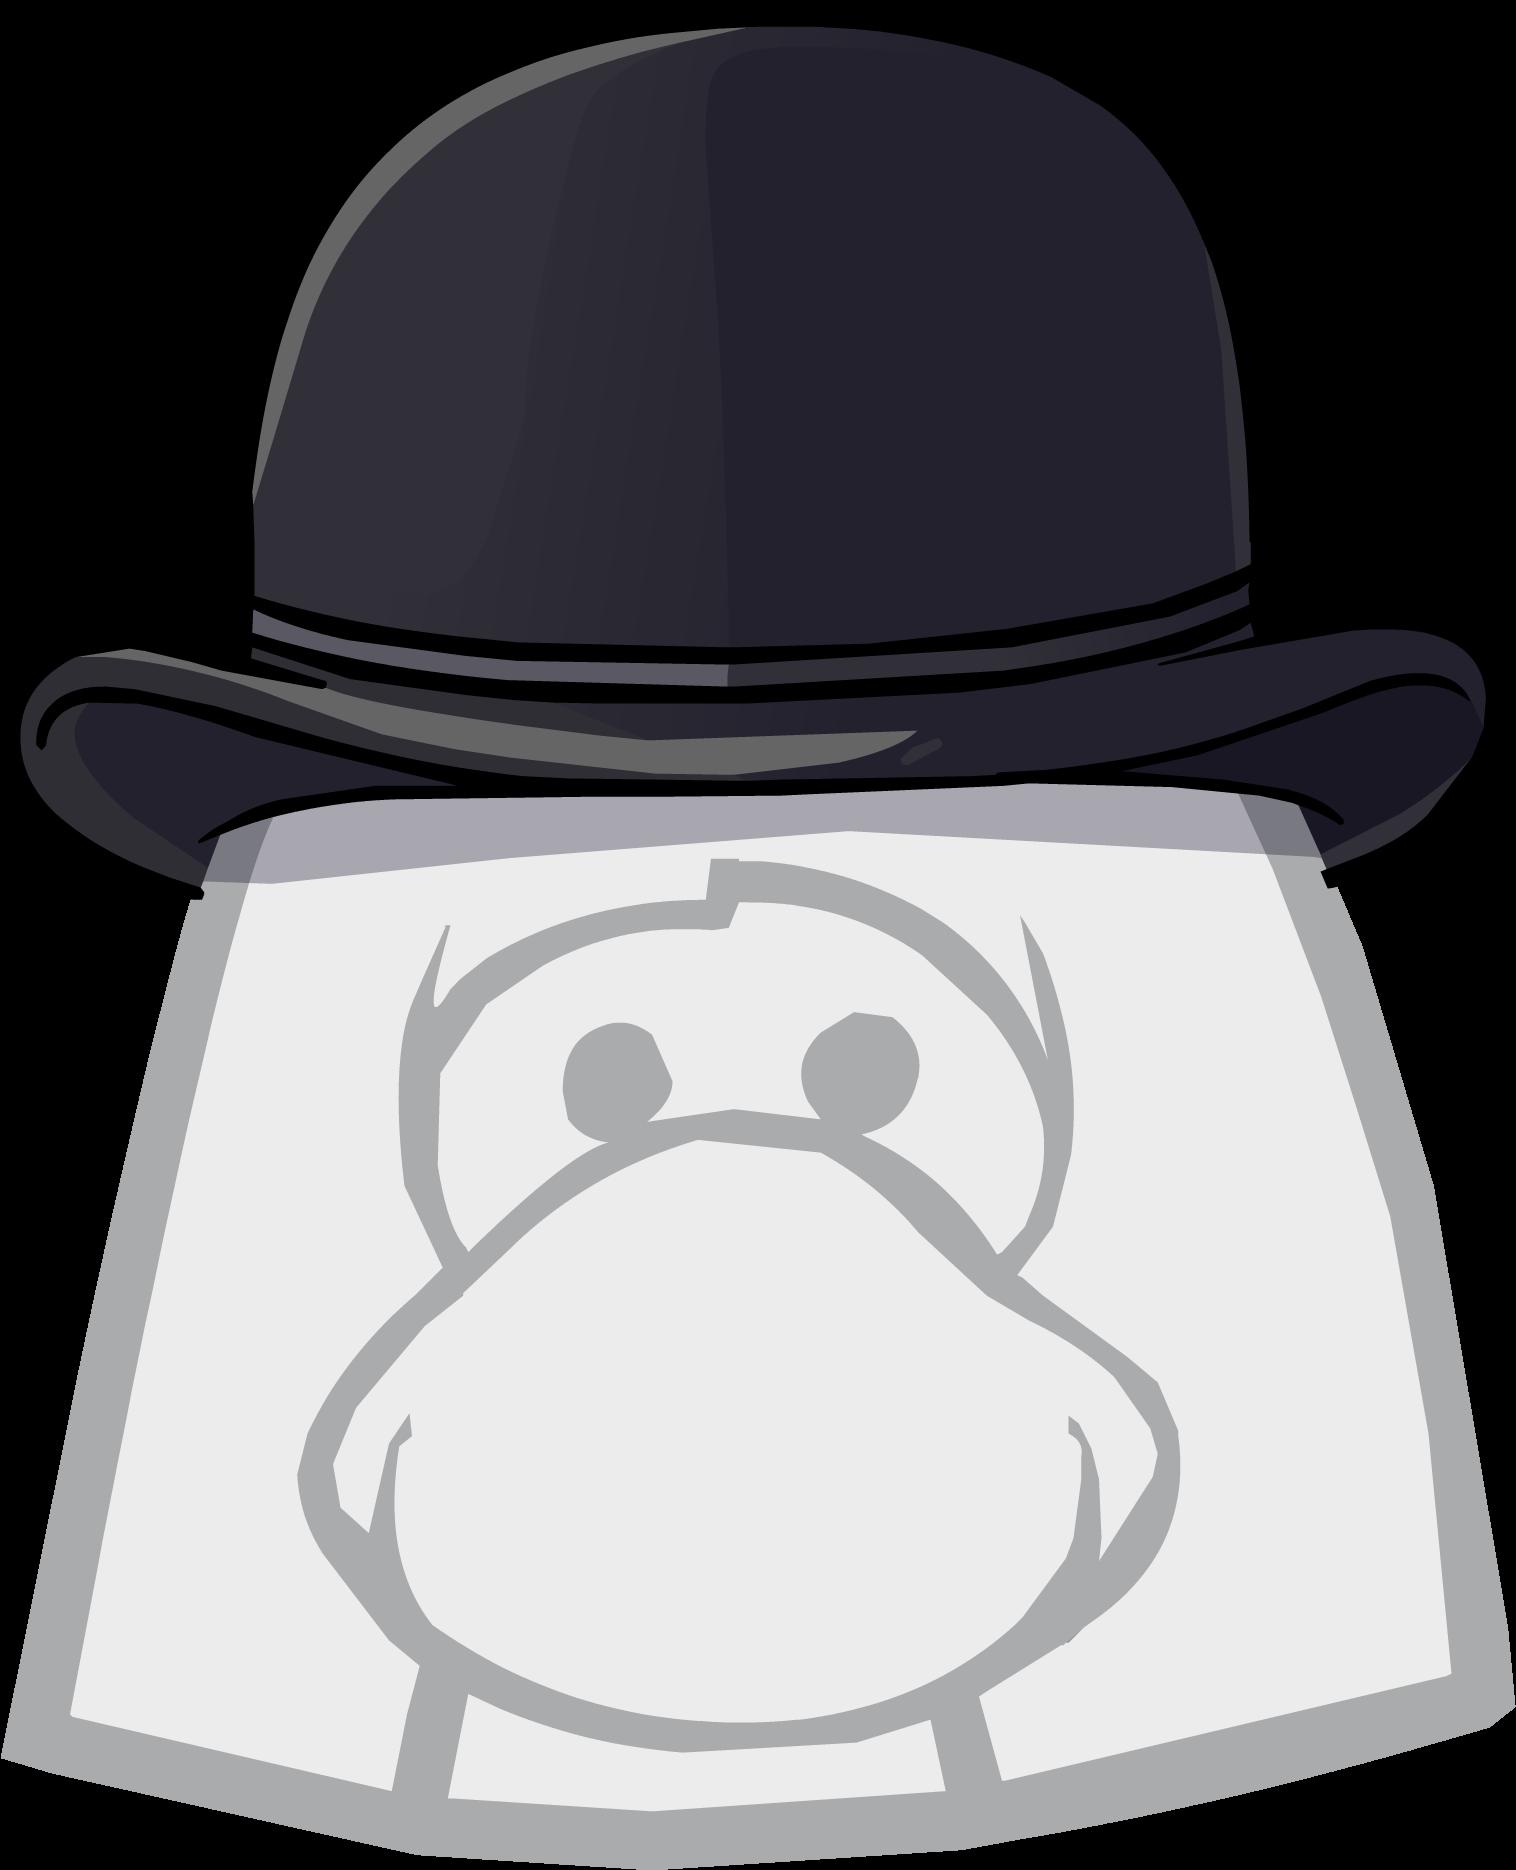 Fedora clipart bowler hat. Club penguin wiki fandom